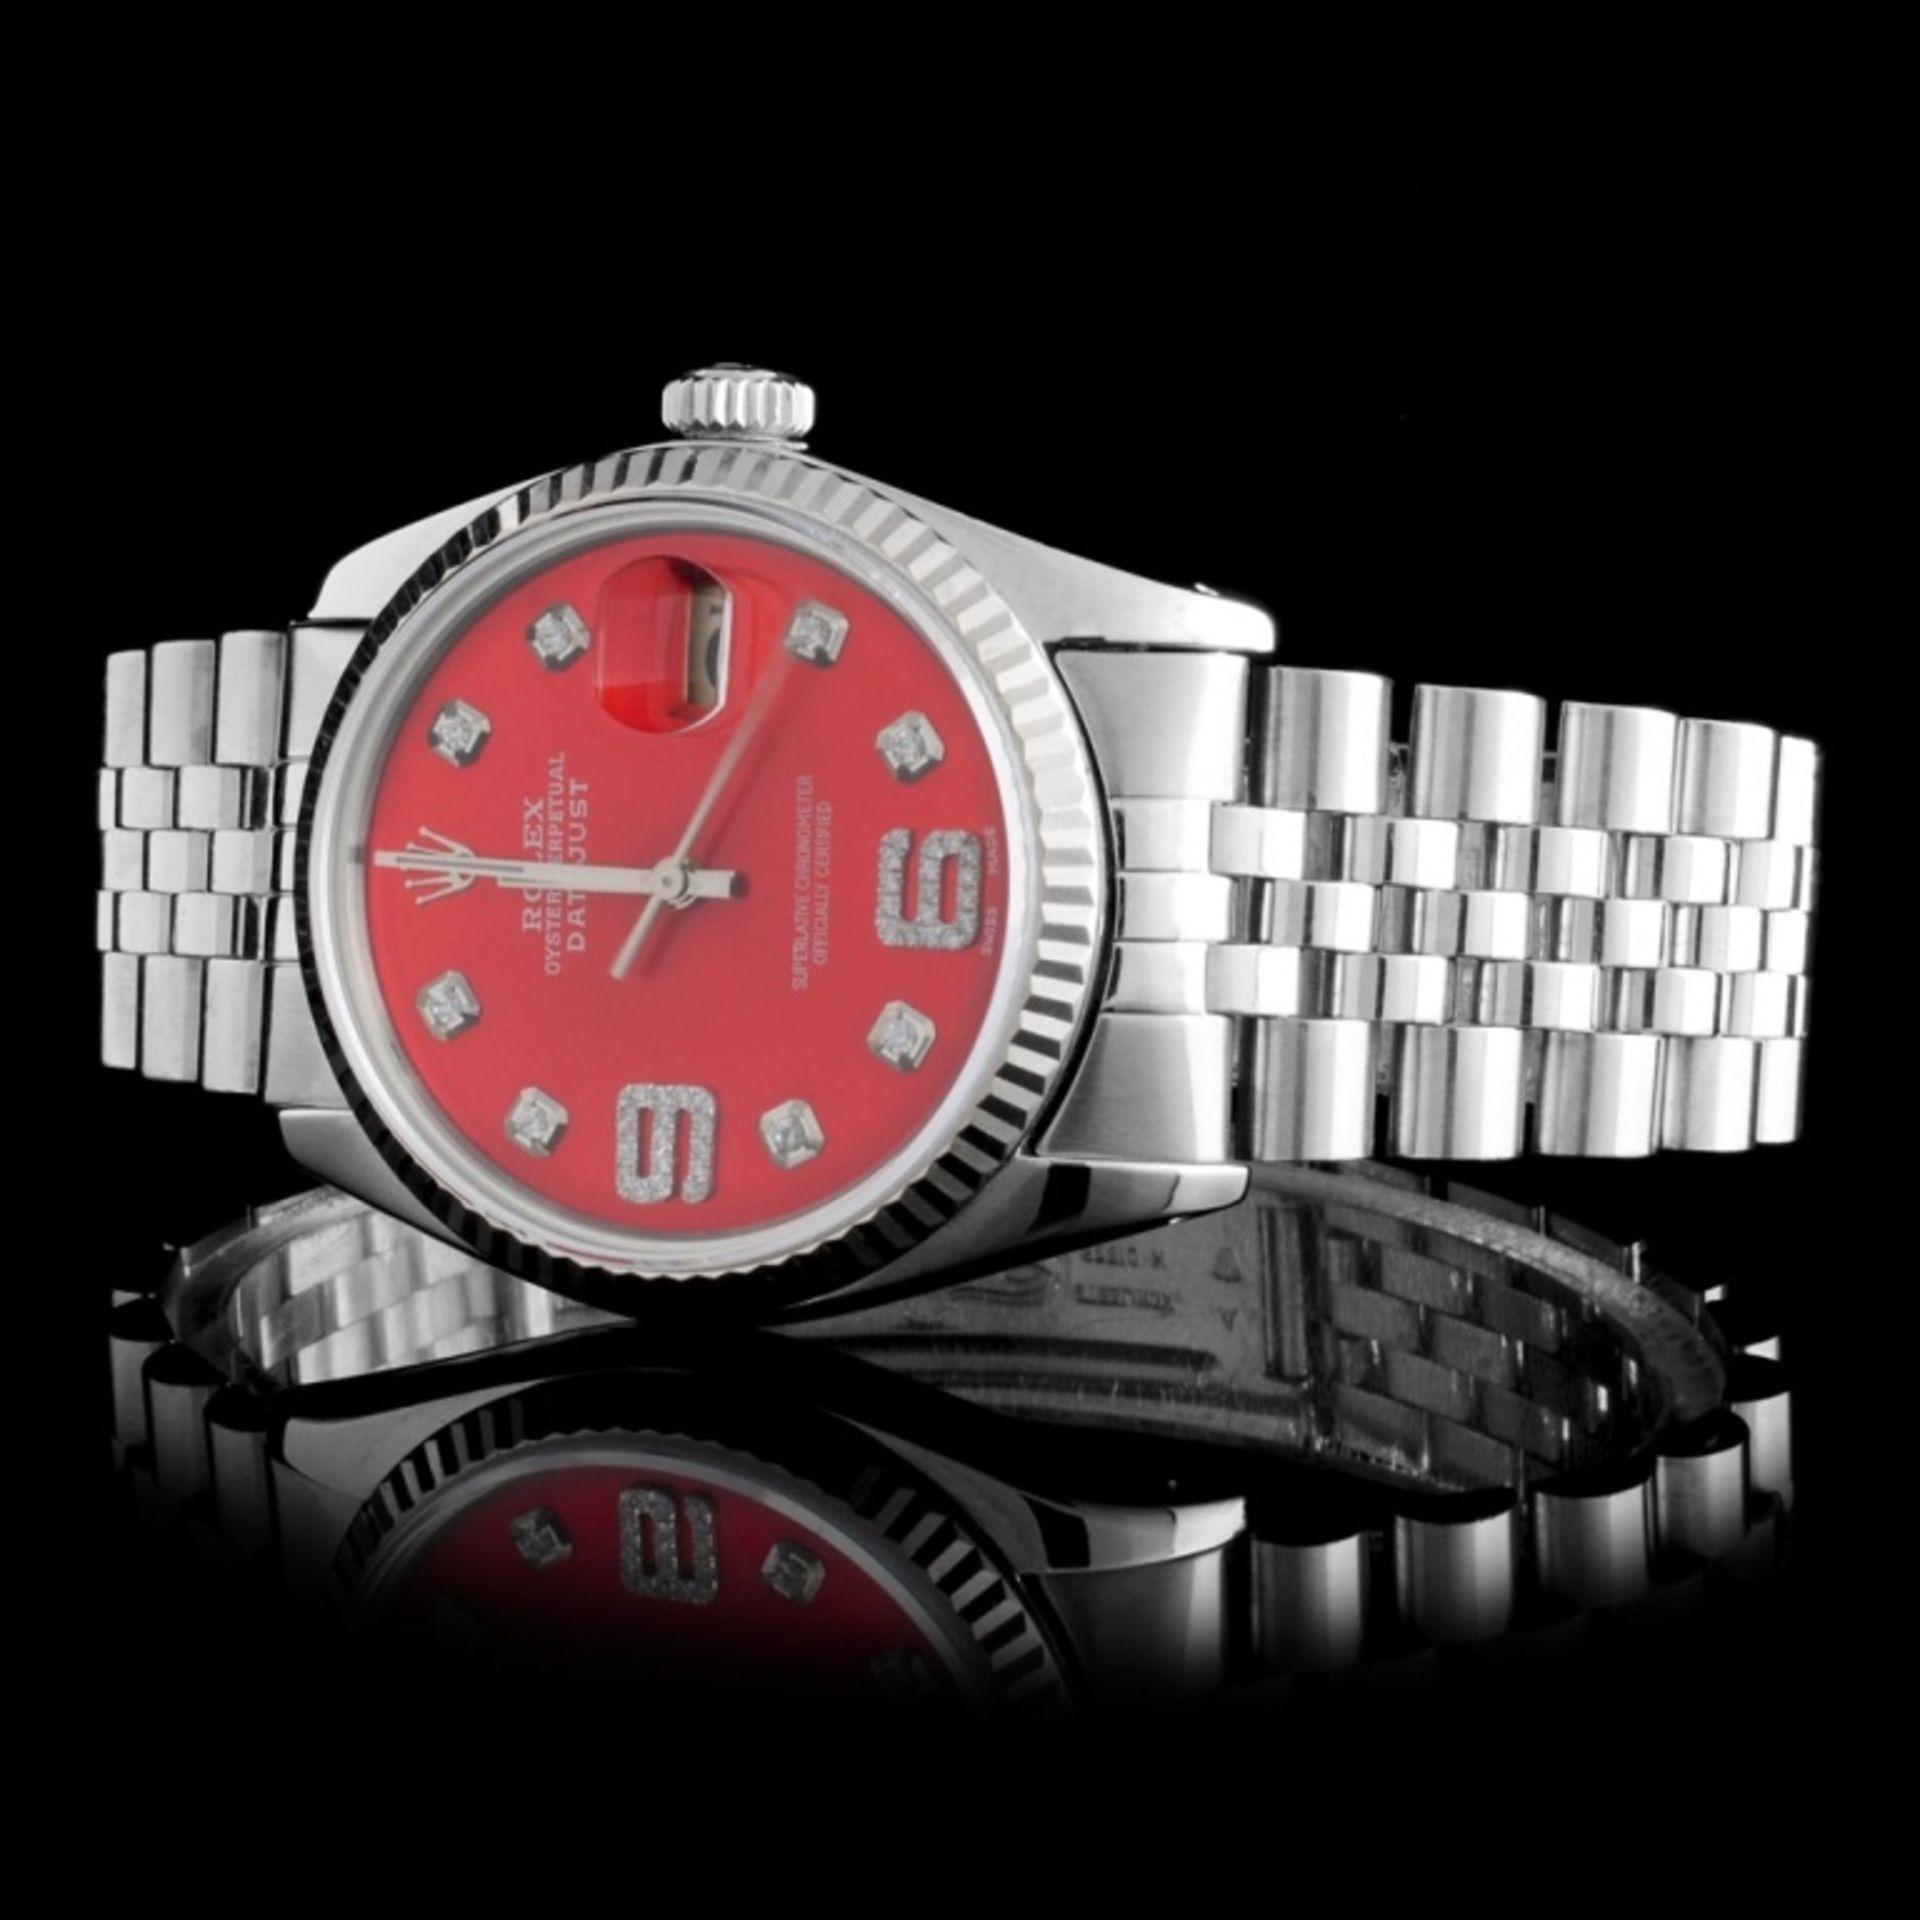 Rolex SS DateJust Diamond 36MM Wristwatch - Image 2 of 5